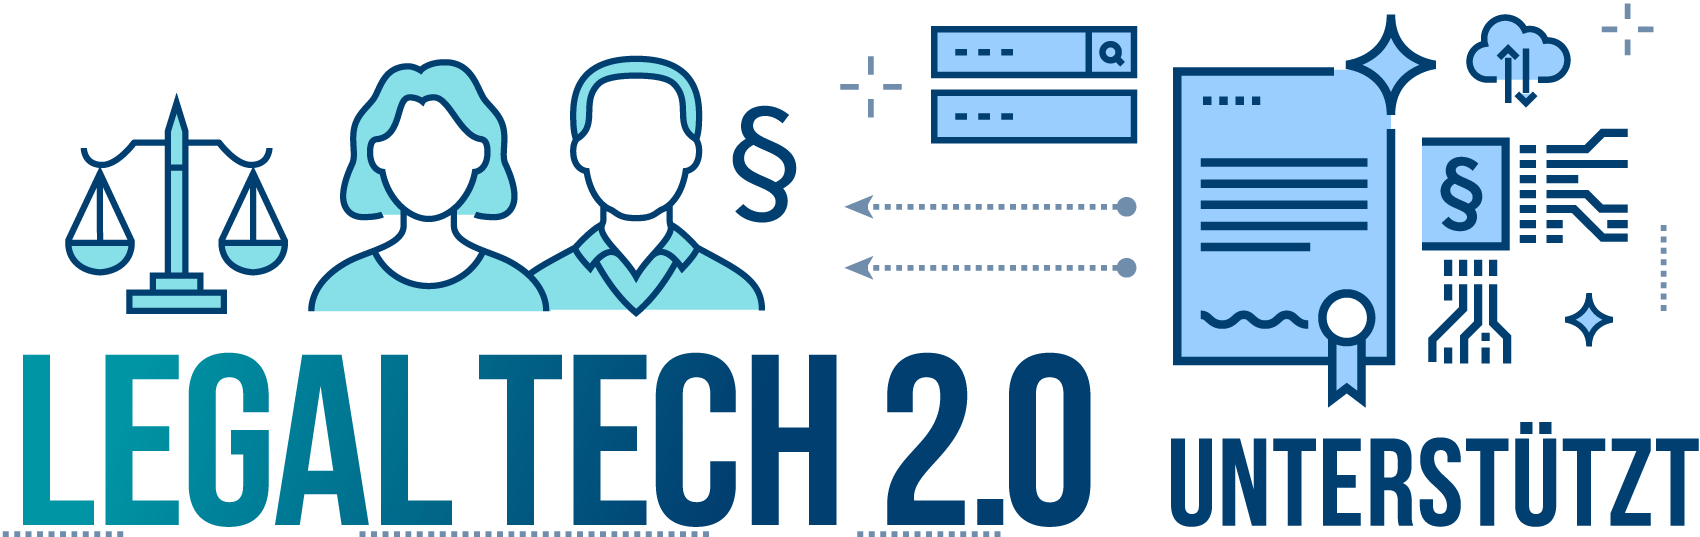 LegalTech_2.0_unterstuetzt